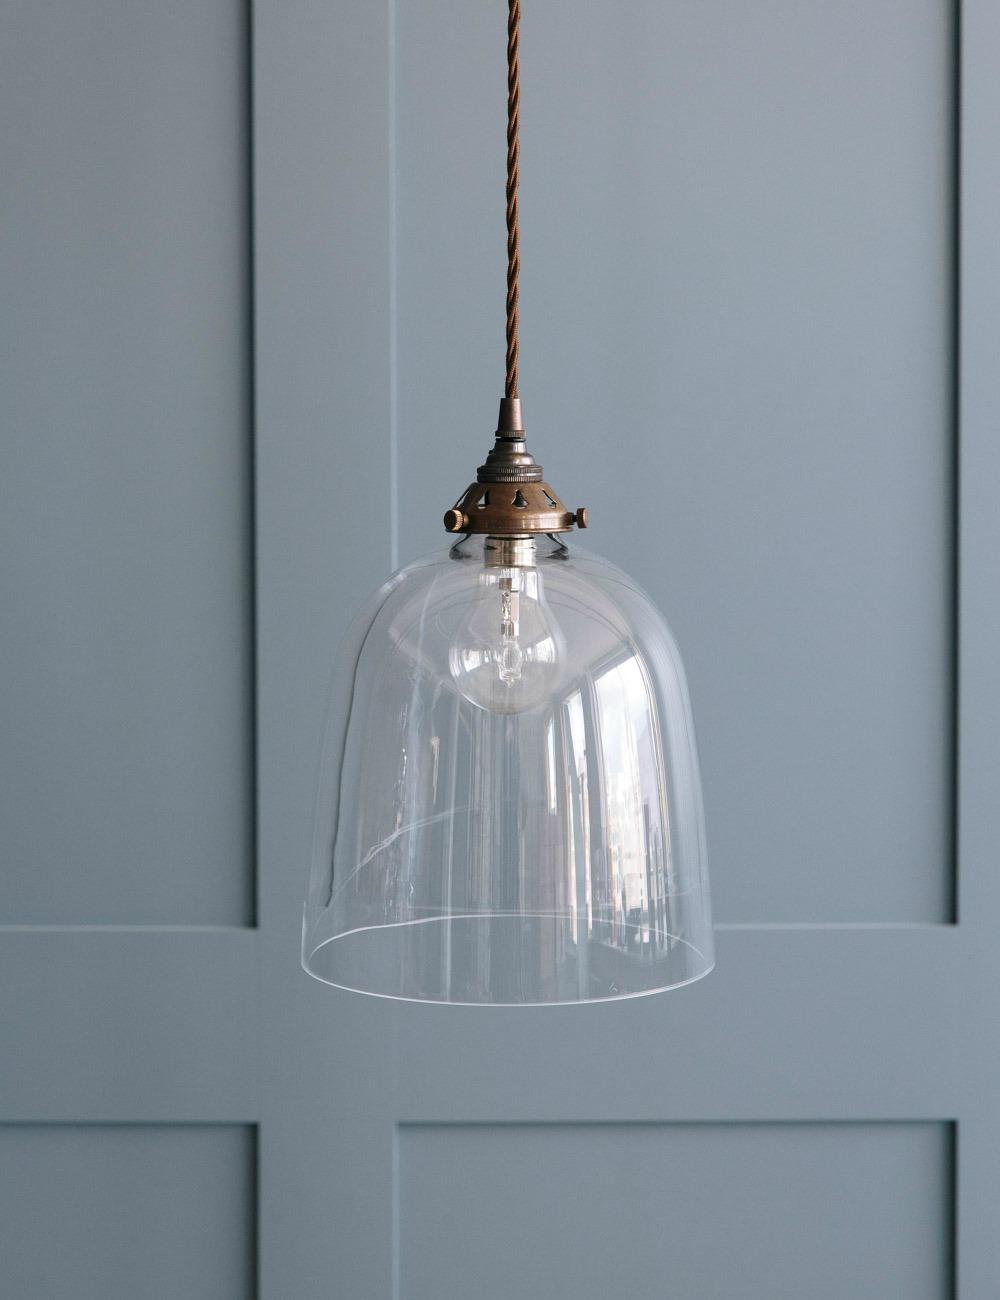 Bell Blown Glass Pendant Light - Various Sizes